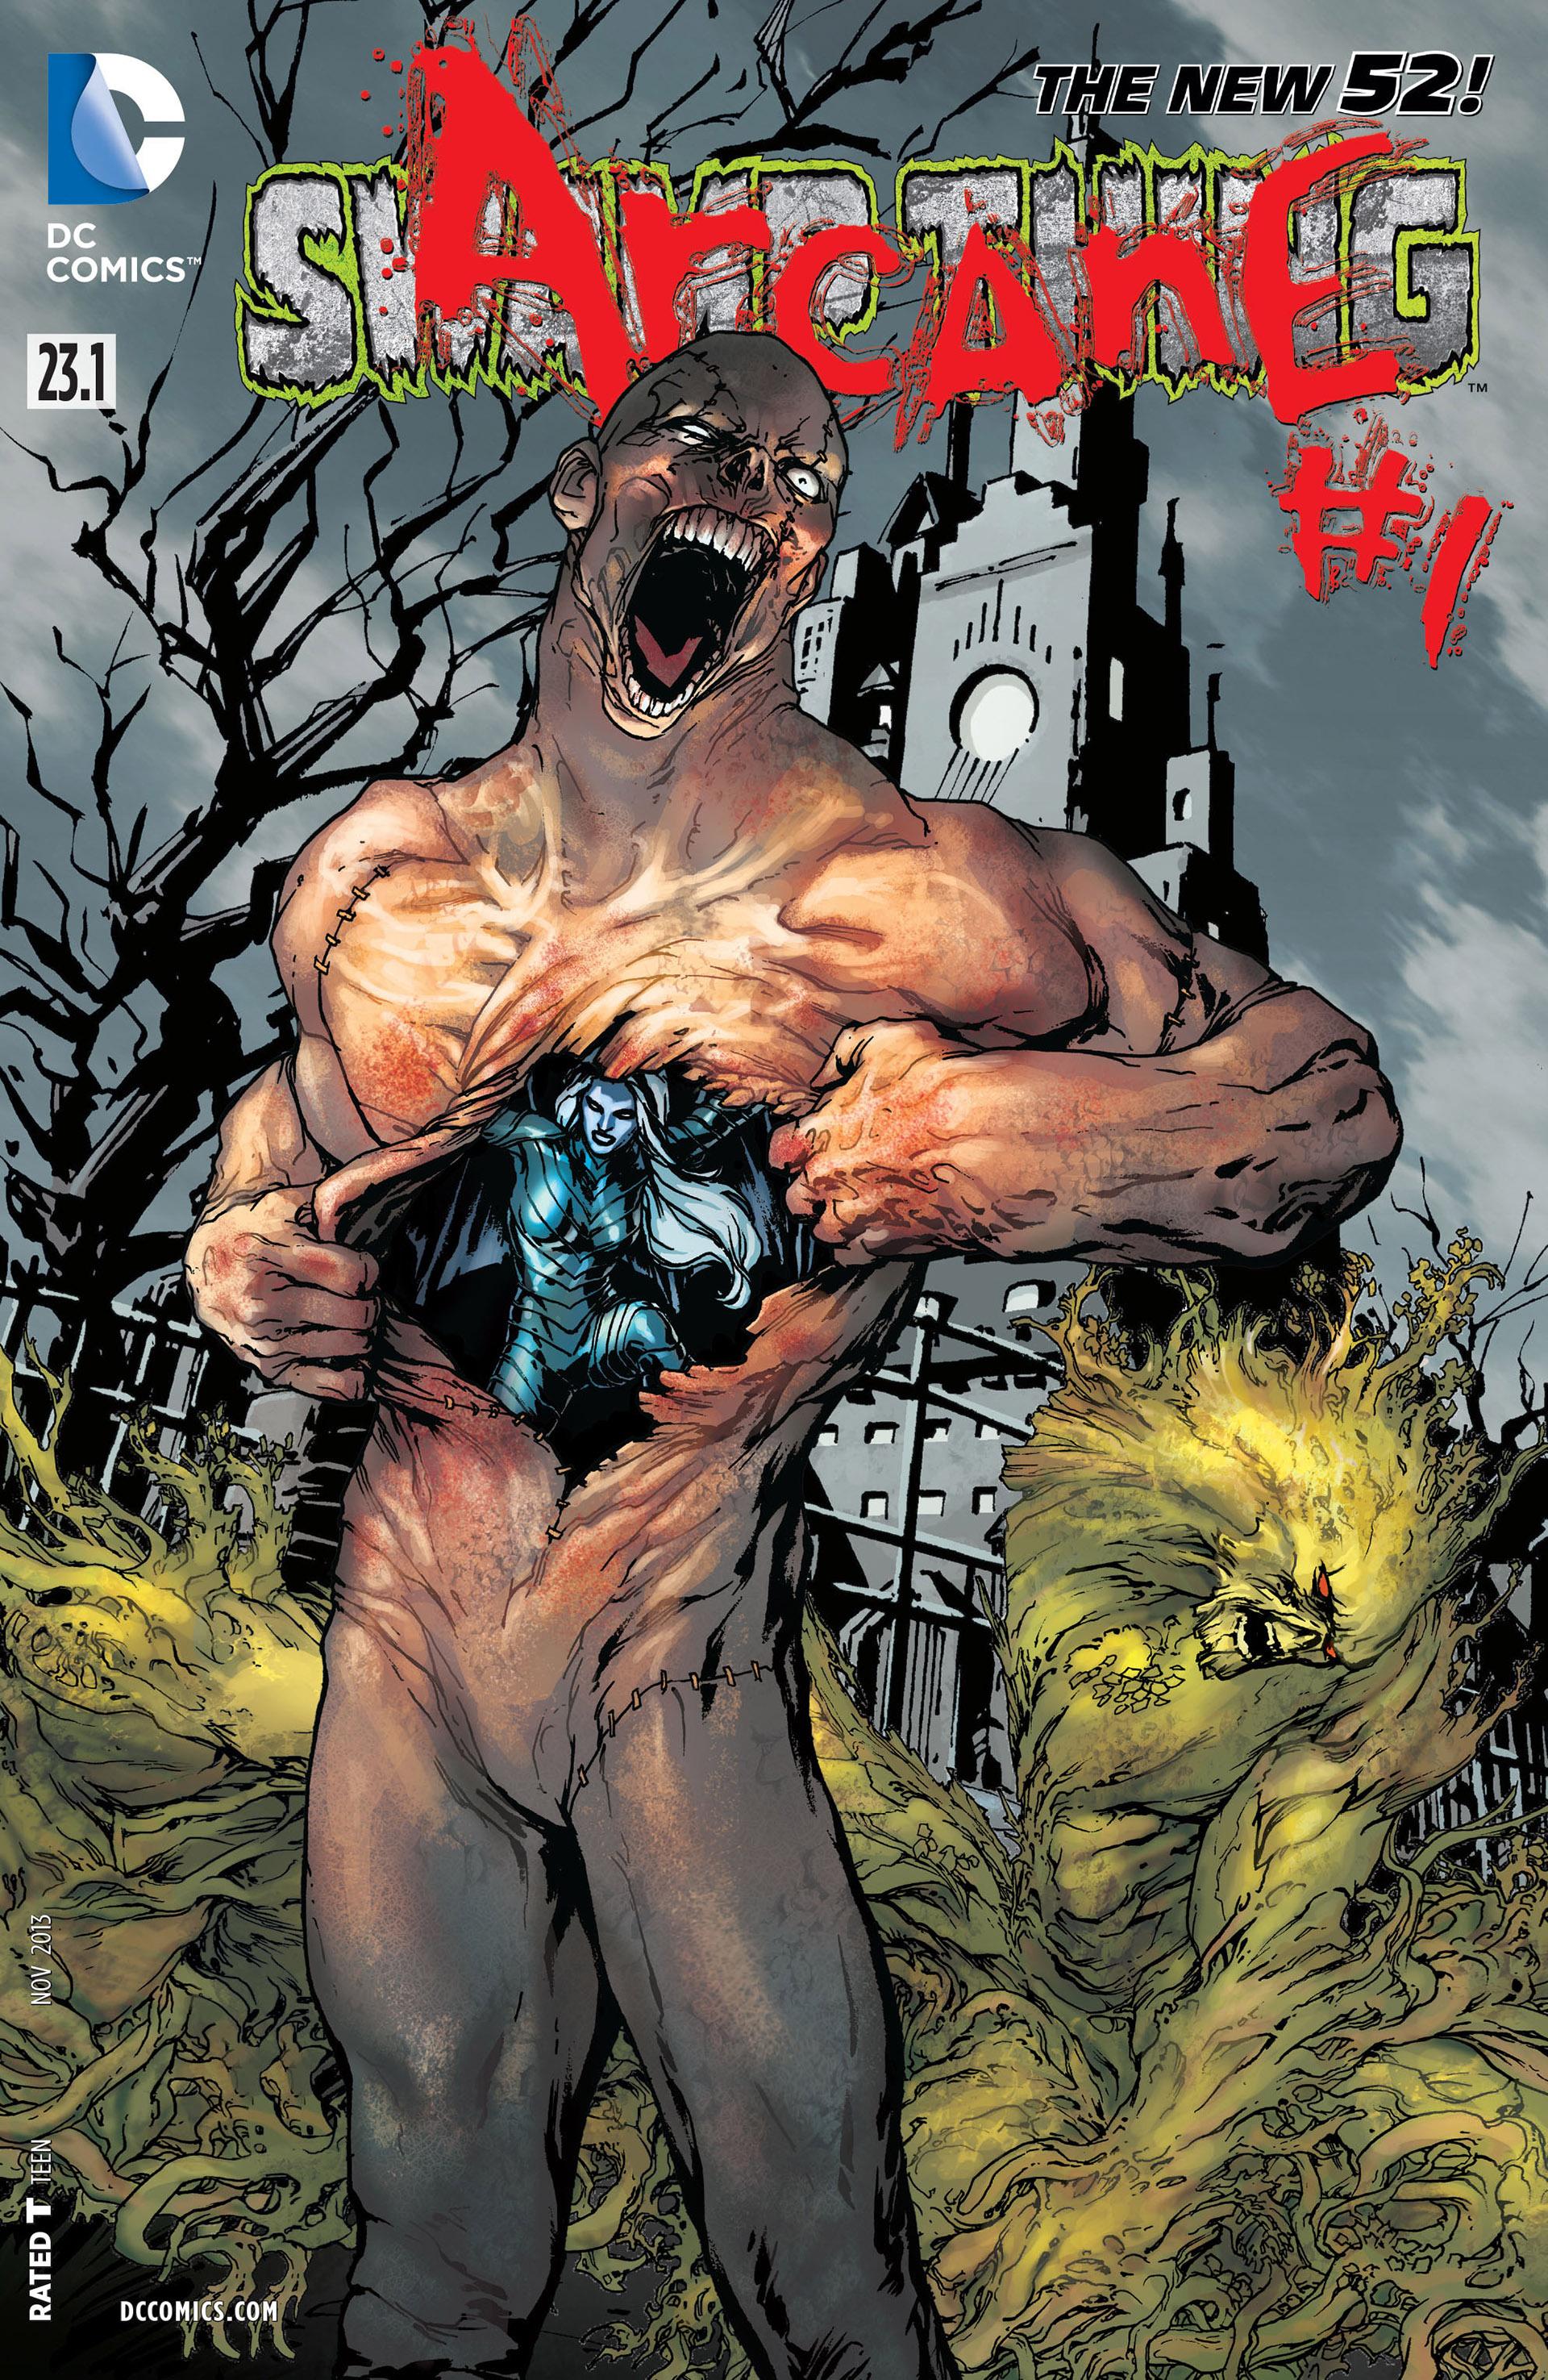 Swamp Thing Vol 5 23.1: Arcane